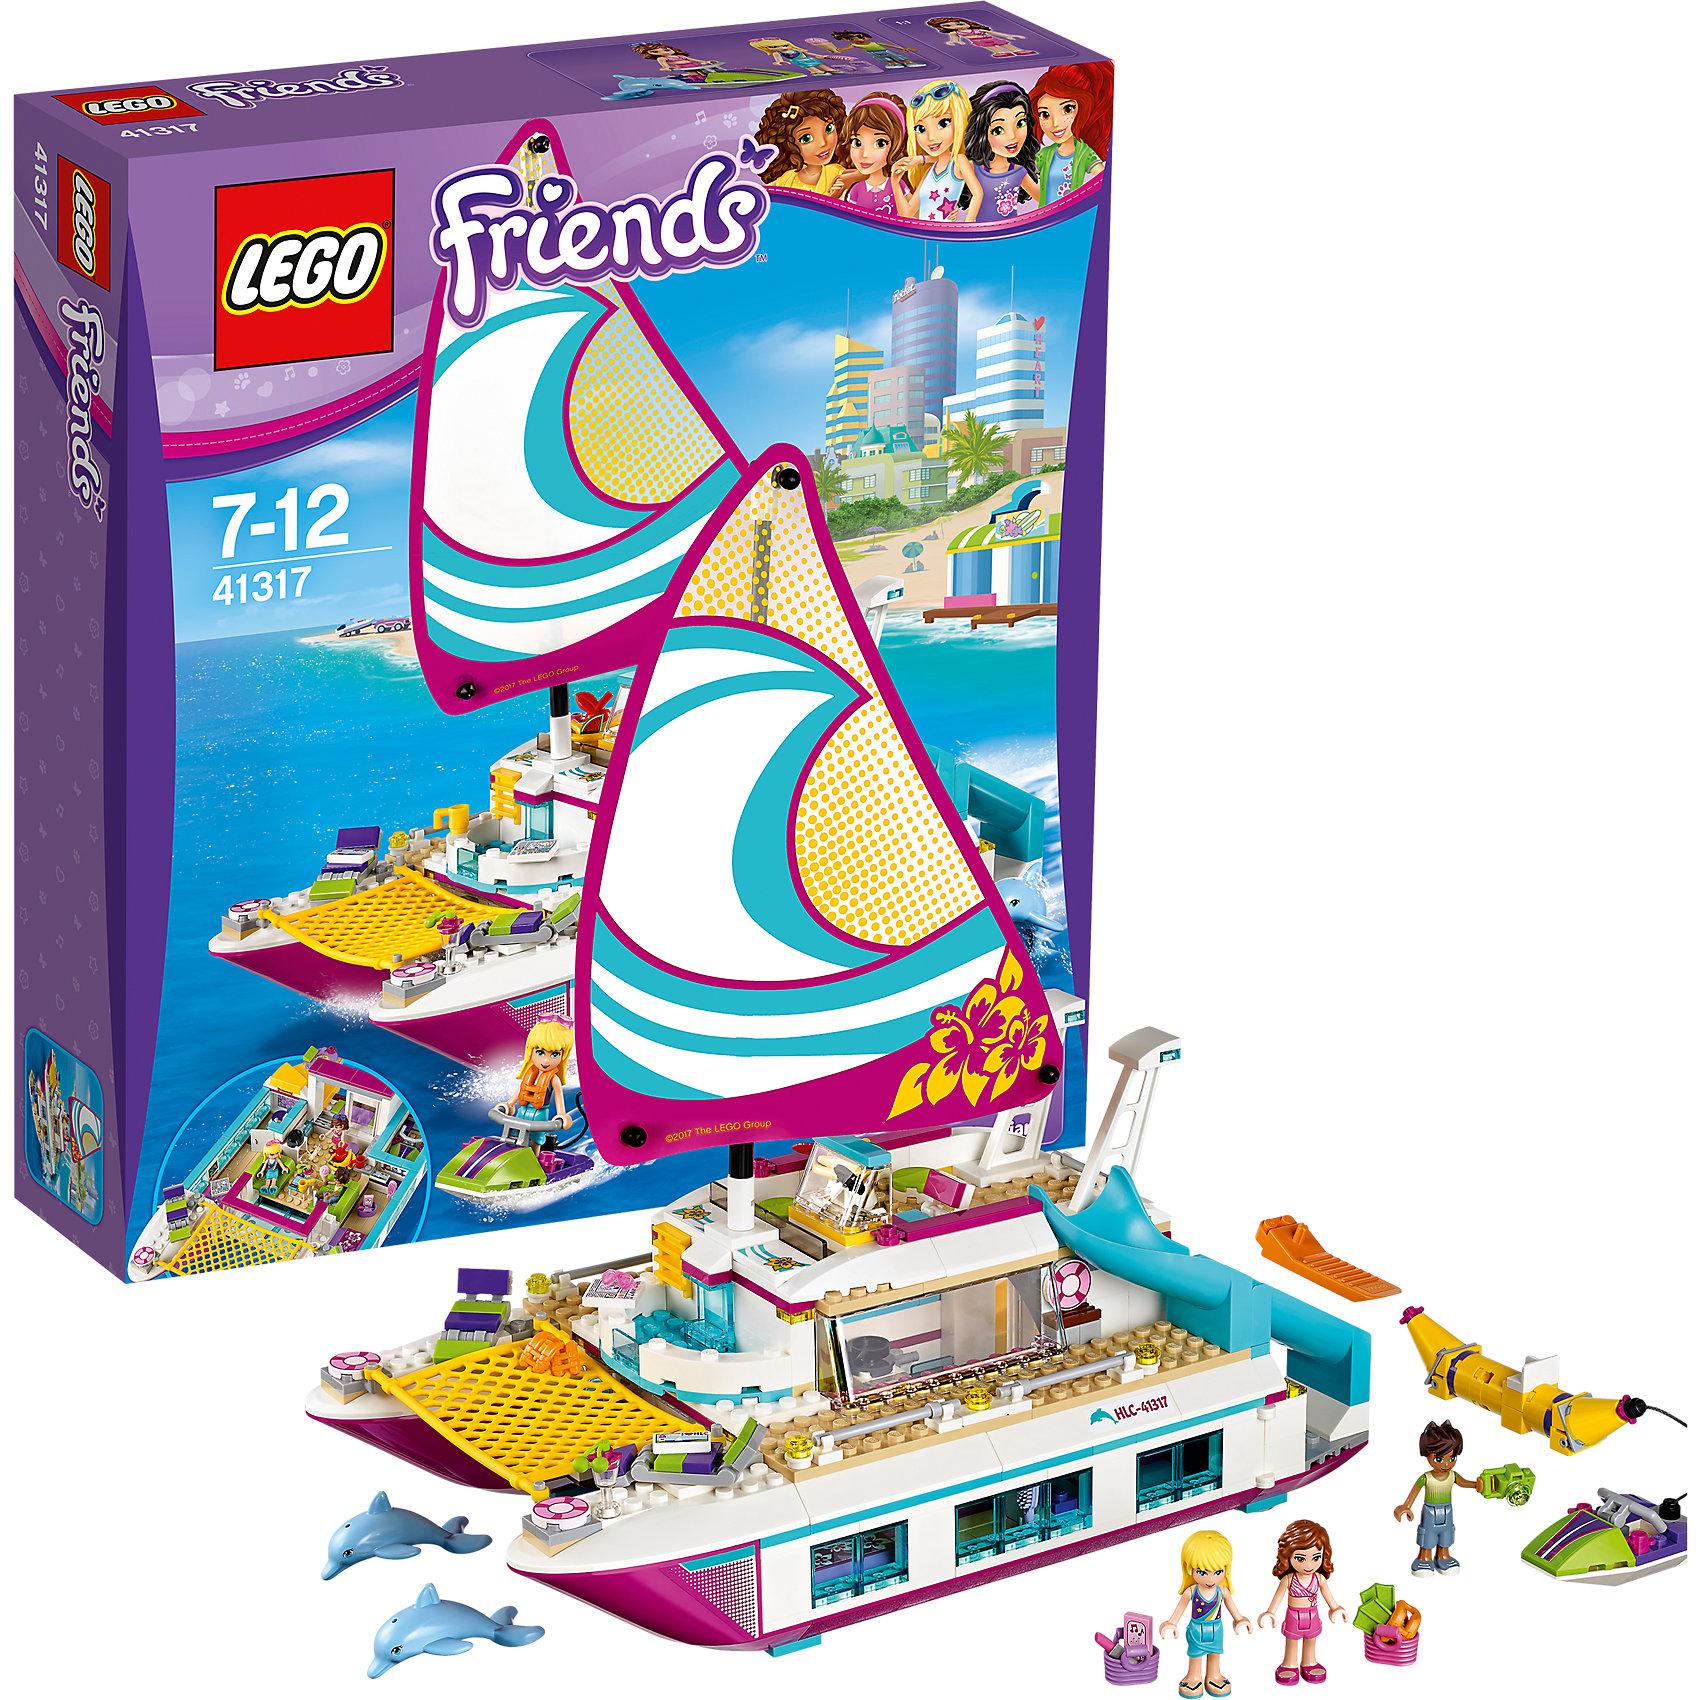 LEGO Friends 41317: Катамаран СаншайнПластмассовые конструкторы<br><br><br>Ширина мм: 378<br>Глубина мм: 347<br>Высота мм: 99<br>Вес г: 1325<br>Возраст от месяцев: 84<br>Возраст до месяцев: 144<br>Пол: Женский<br>Возраст: Детский<br>SKU: 5620047